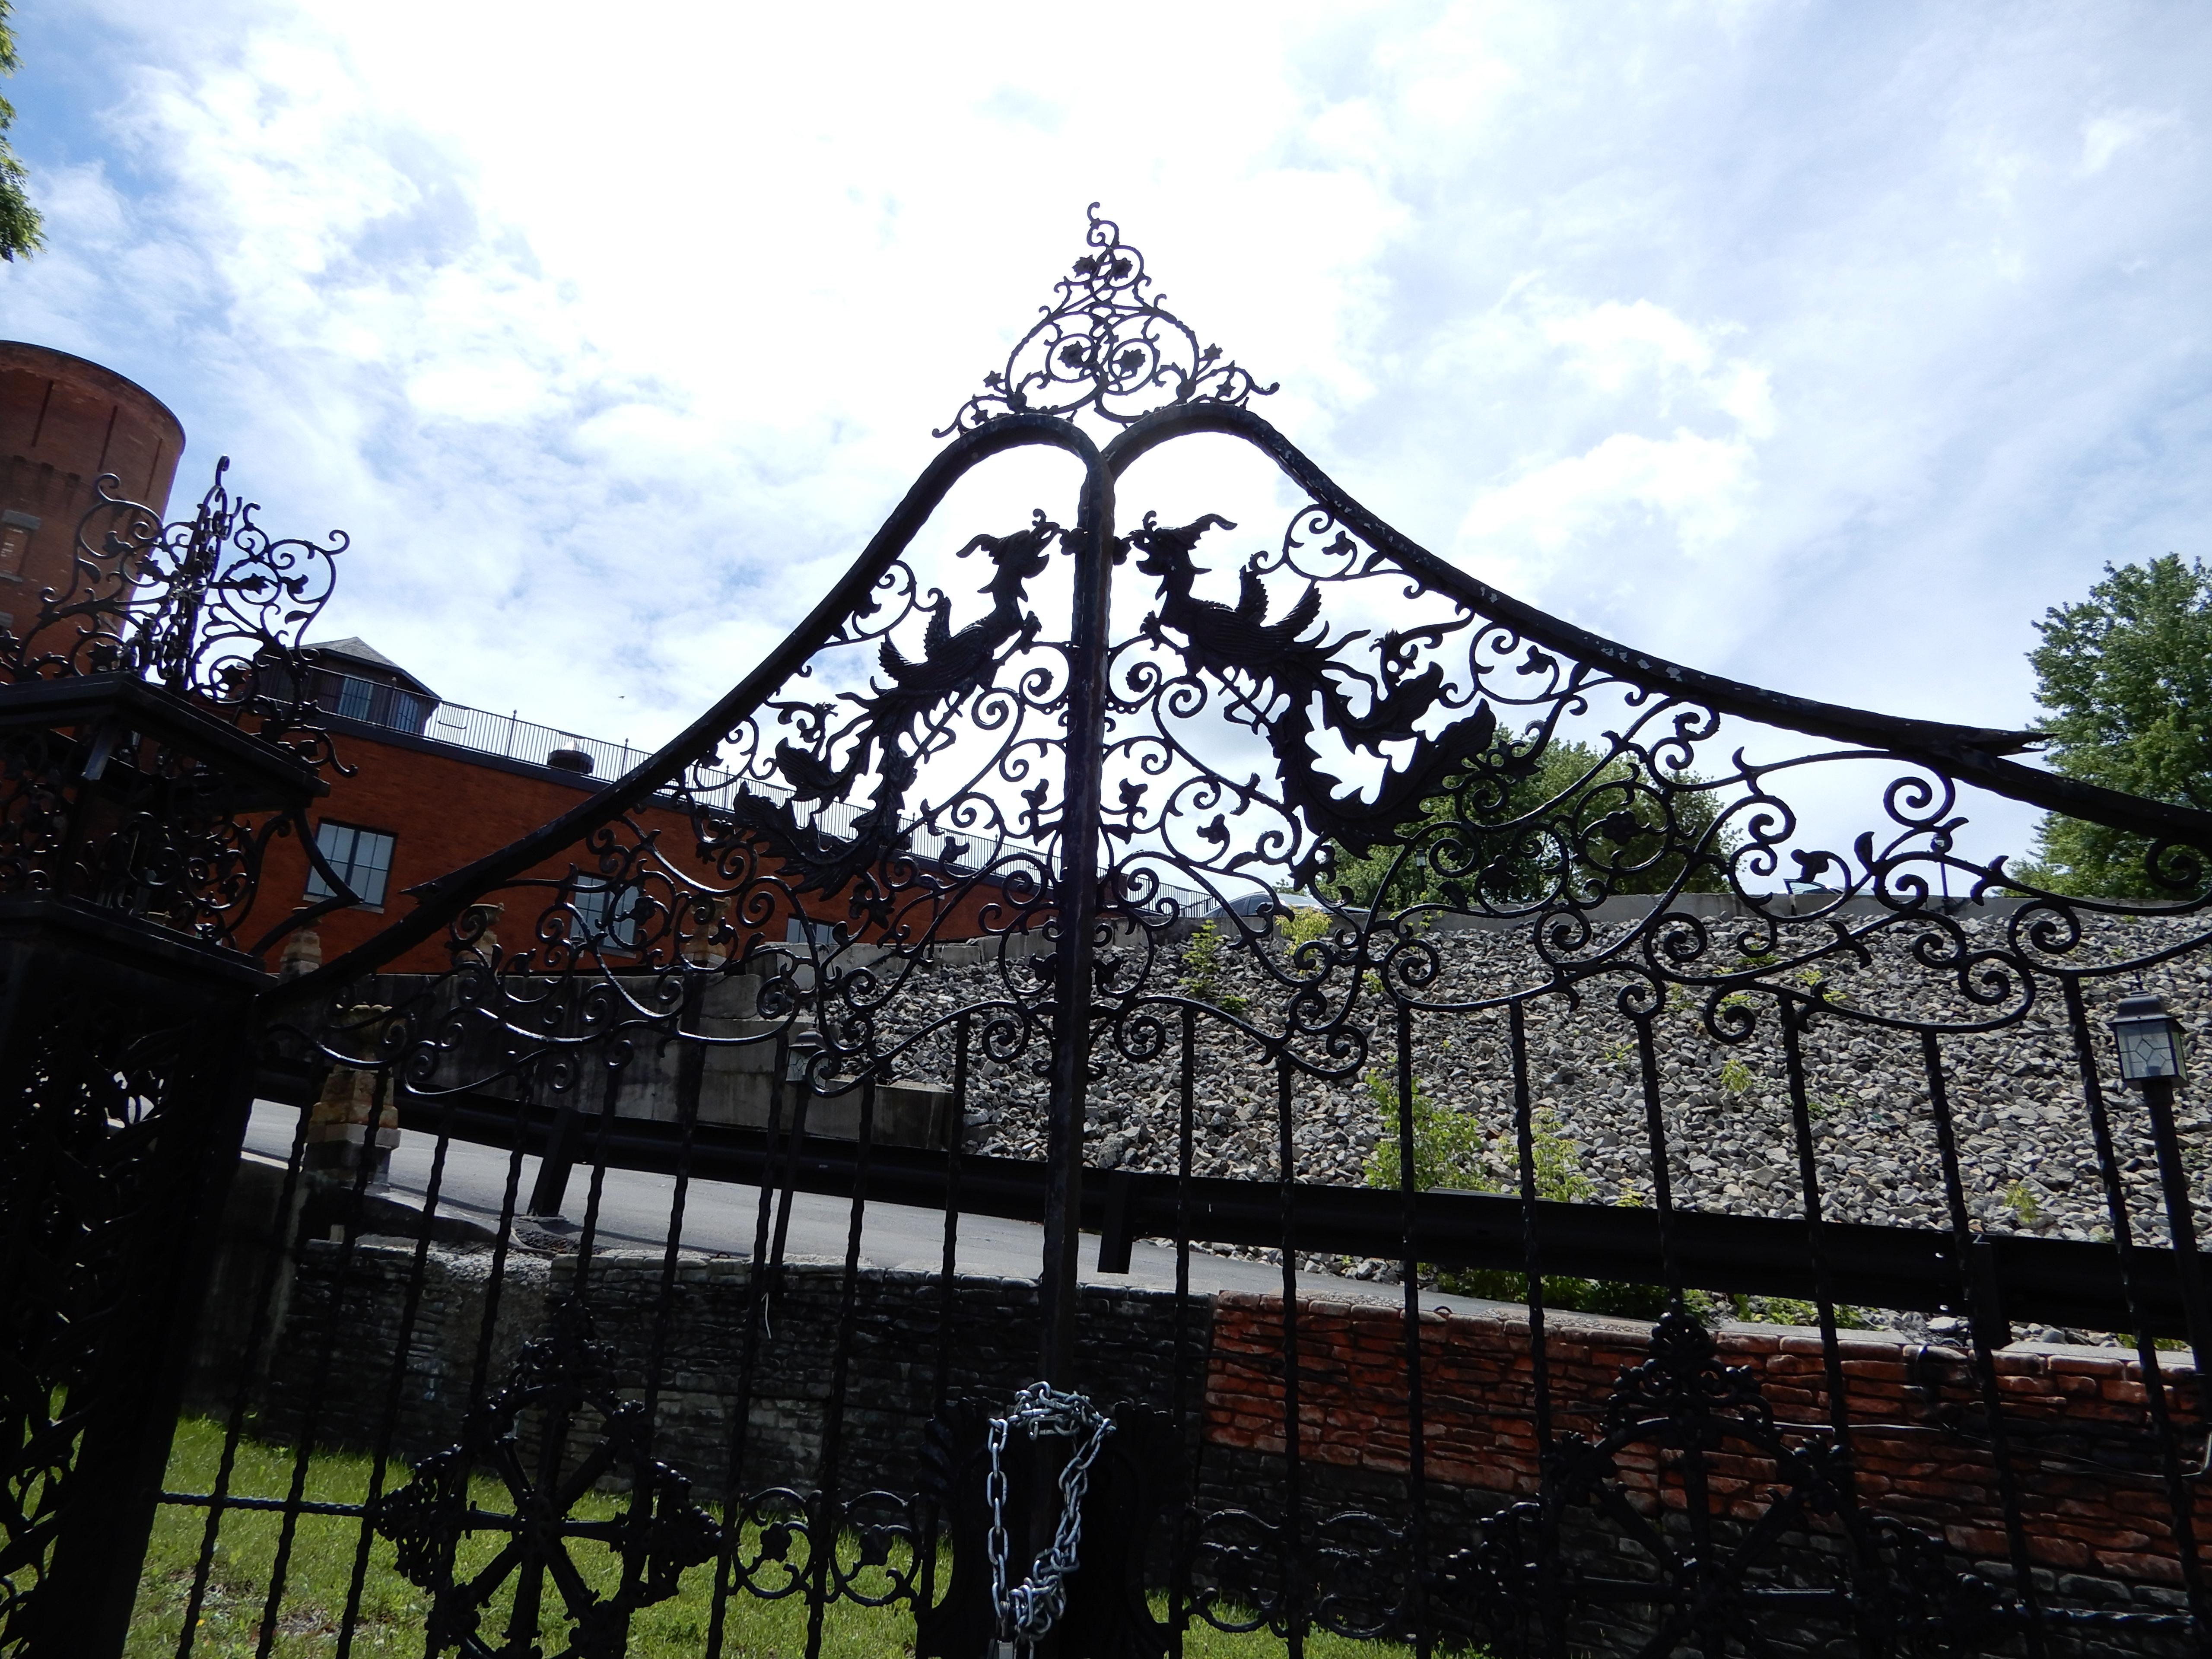 Fancy Ironwork Gates